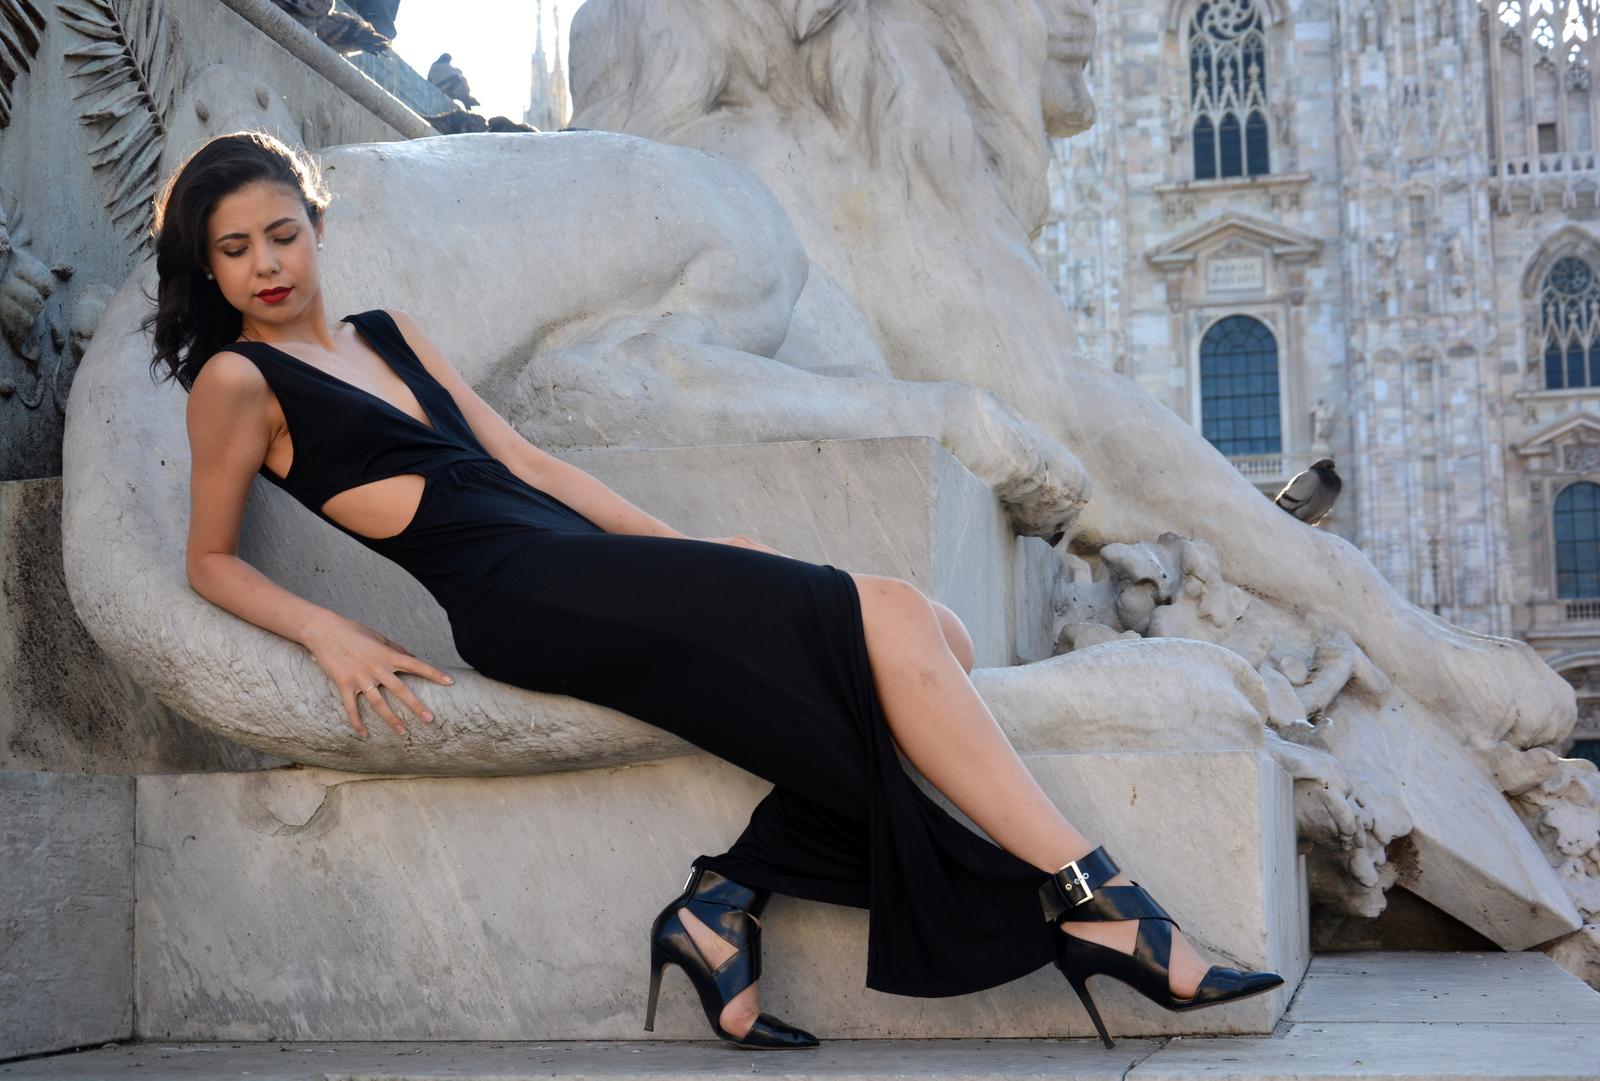 milan, milano, piazza duomo, duomo di milano, italy, juliane borges, shooting, culture and trend